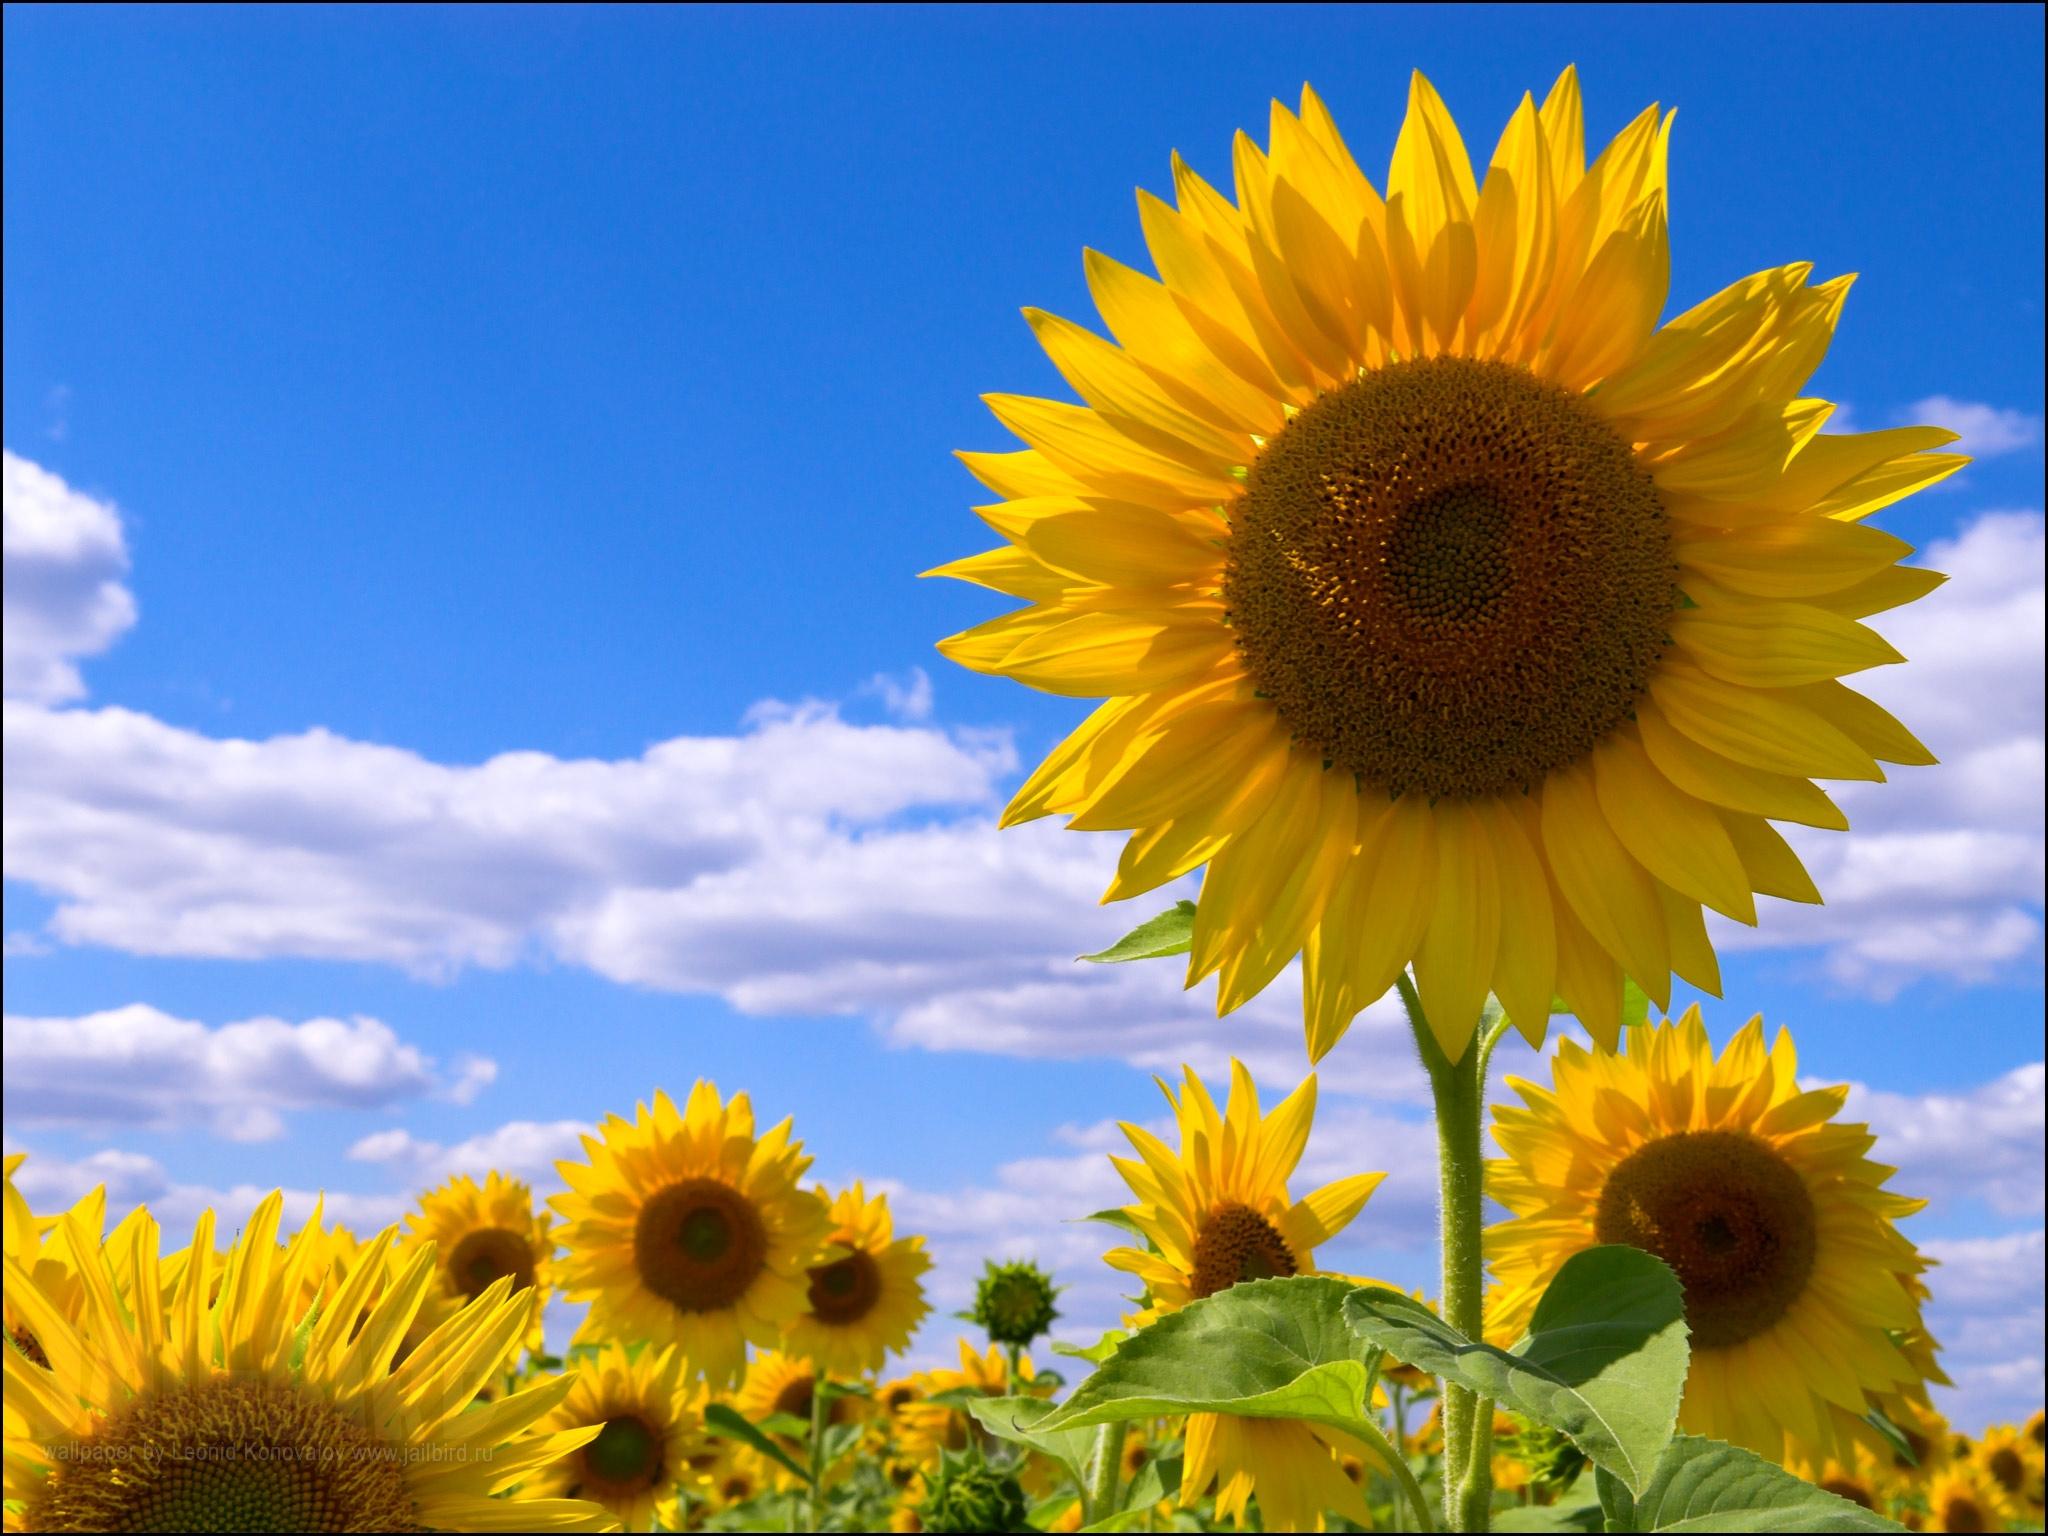 119040 Заставки и Обои Подсолнухи на телефон. Скачать Цветы, Поле, Небо, Облака, Лето, Подсолнухи картинки бесплатно